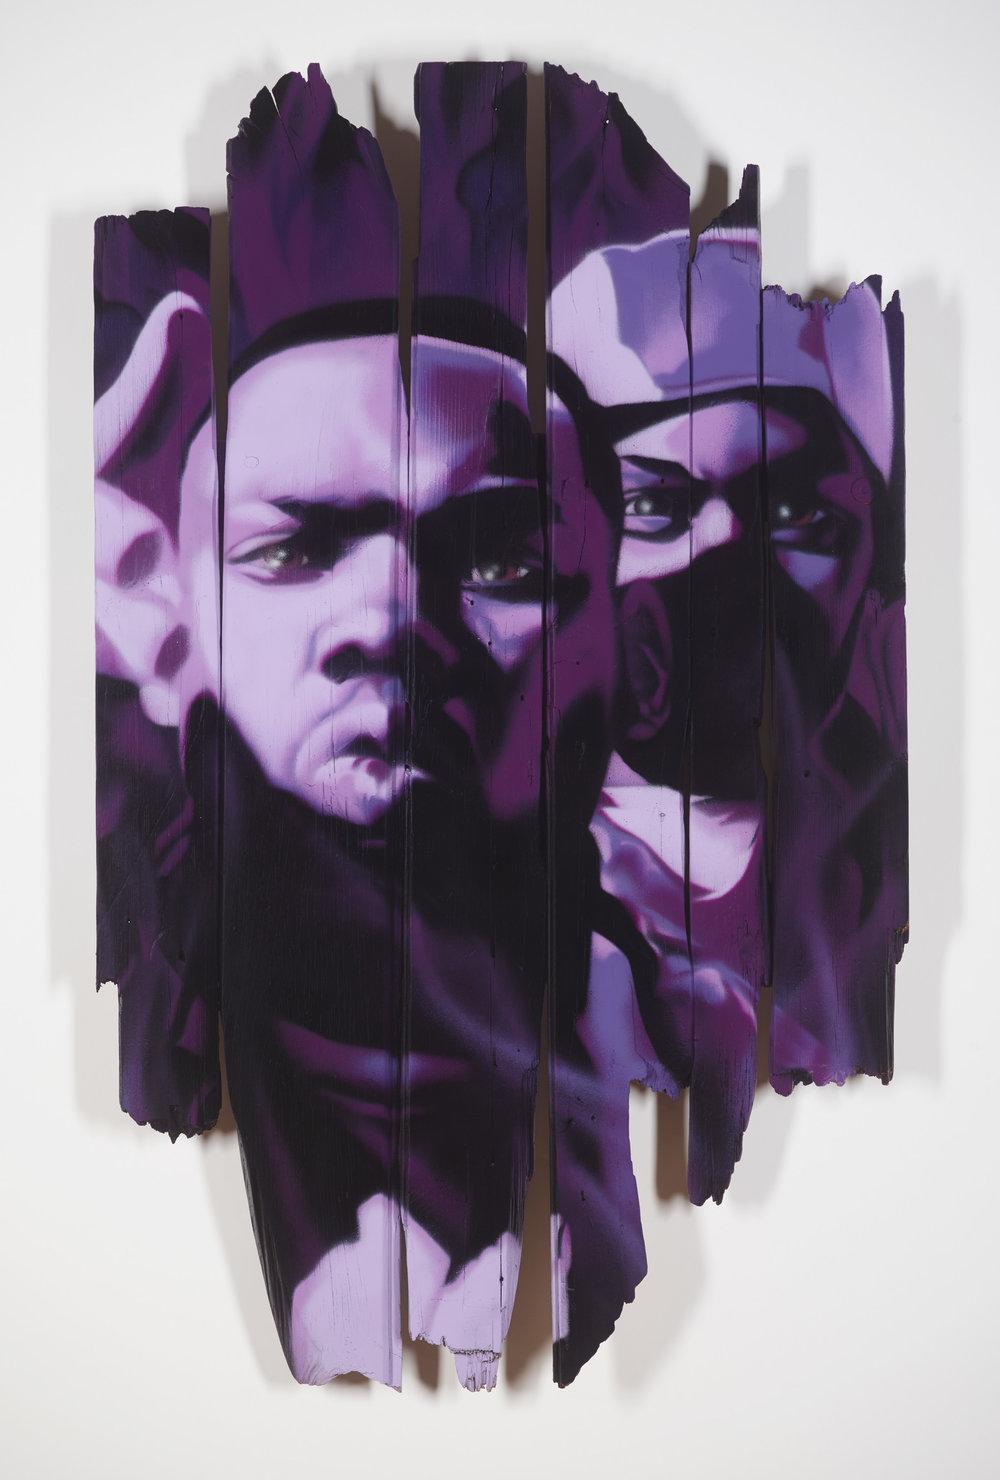 The Purple Tape